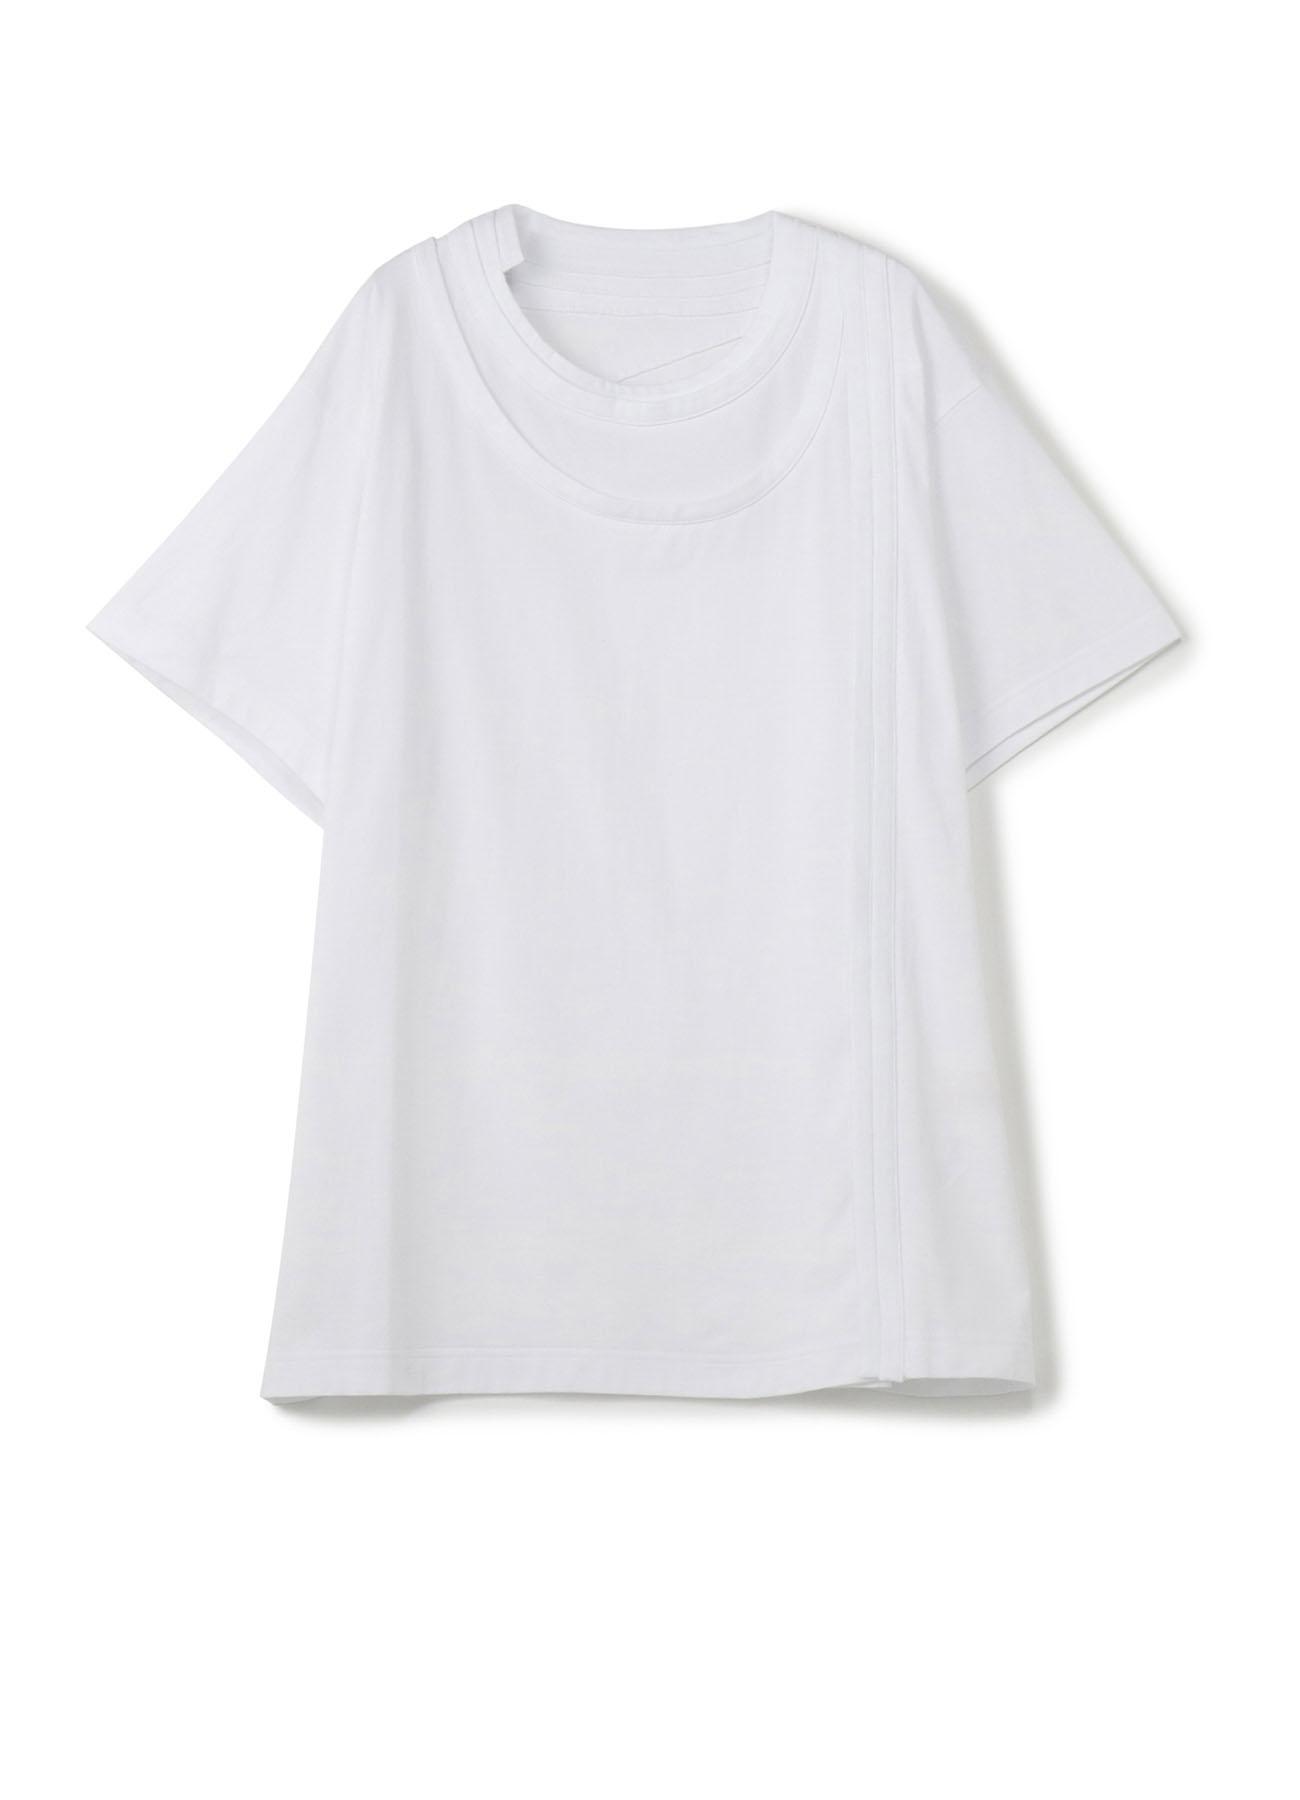 30 / Cotton Plane Stitches String大号T恤短袖